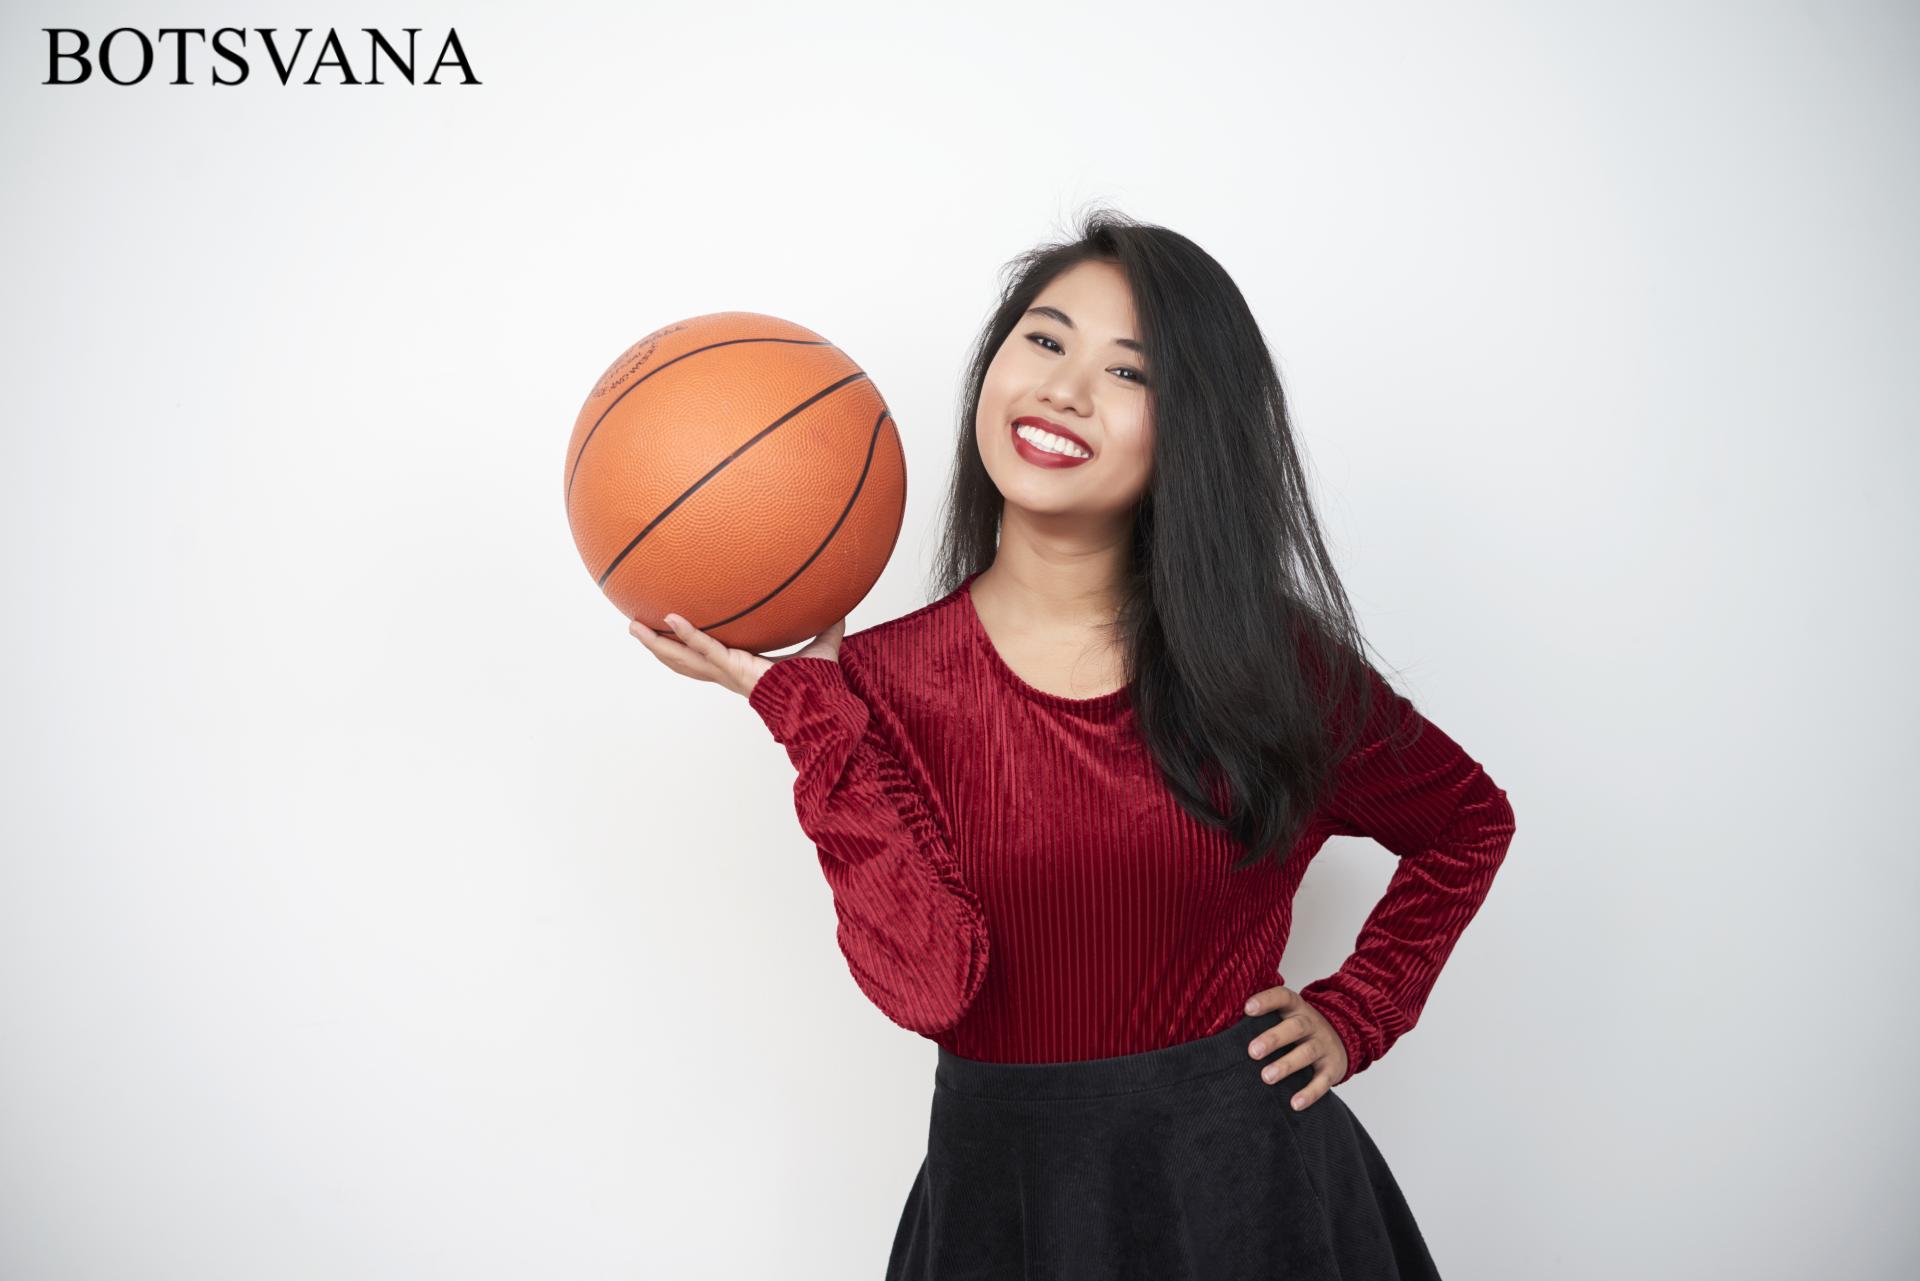 basketbol nasıl bulundu - Basketbol Nasıl Bulundu?